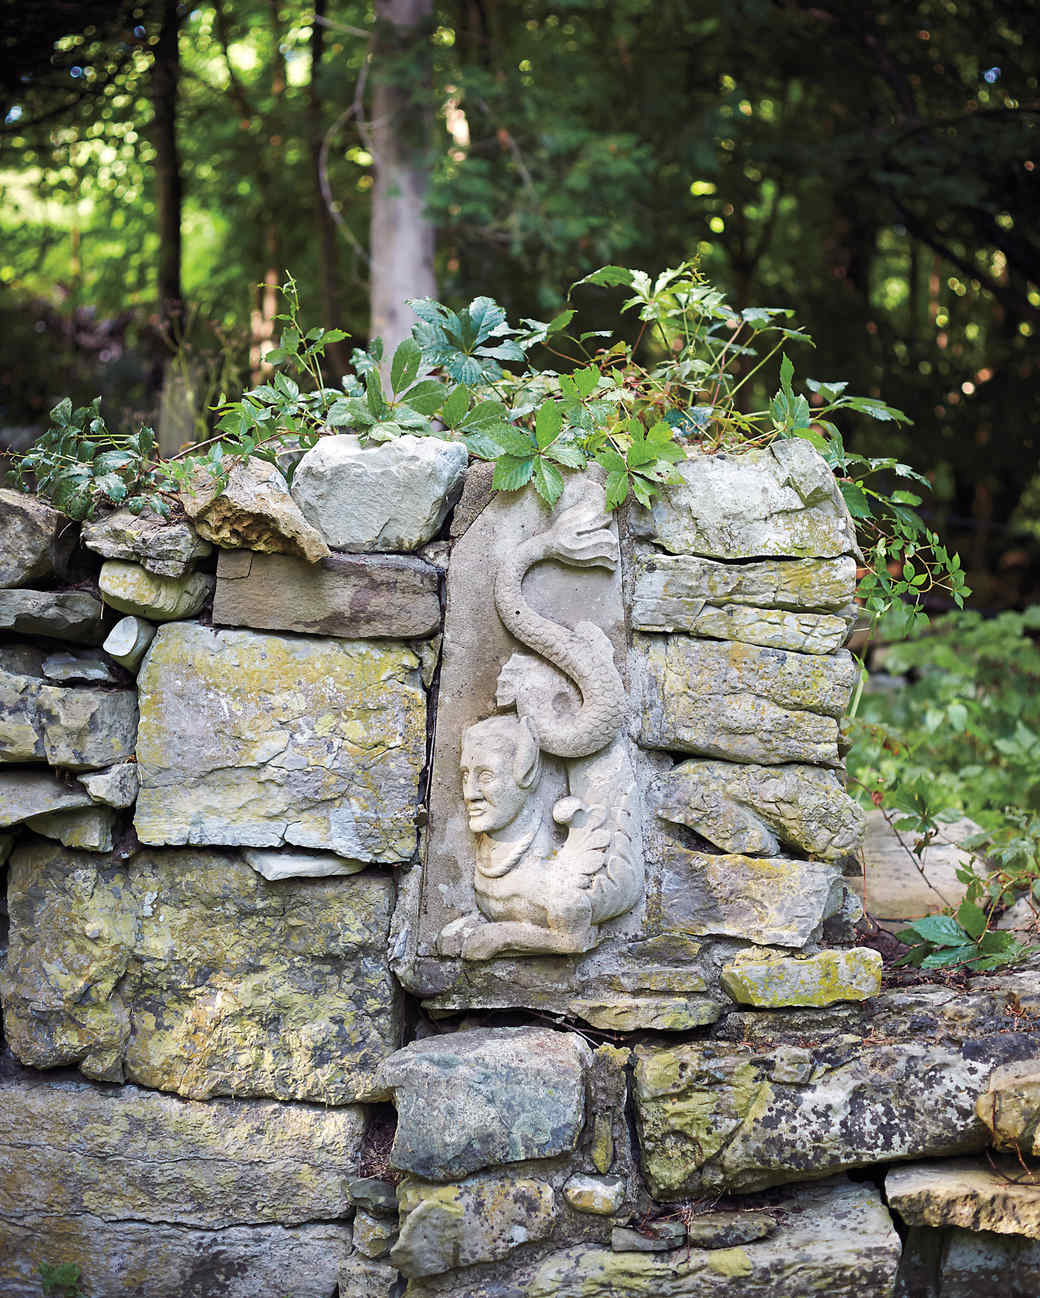 meadowburn-farm-garden-statuary-009-d111449.jpg